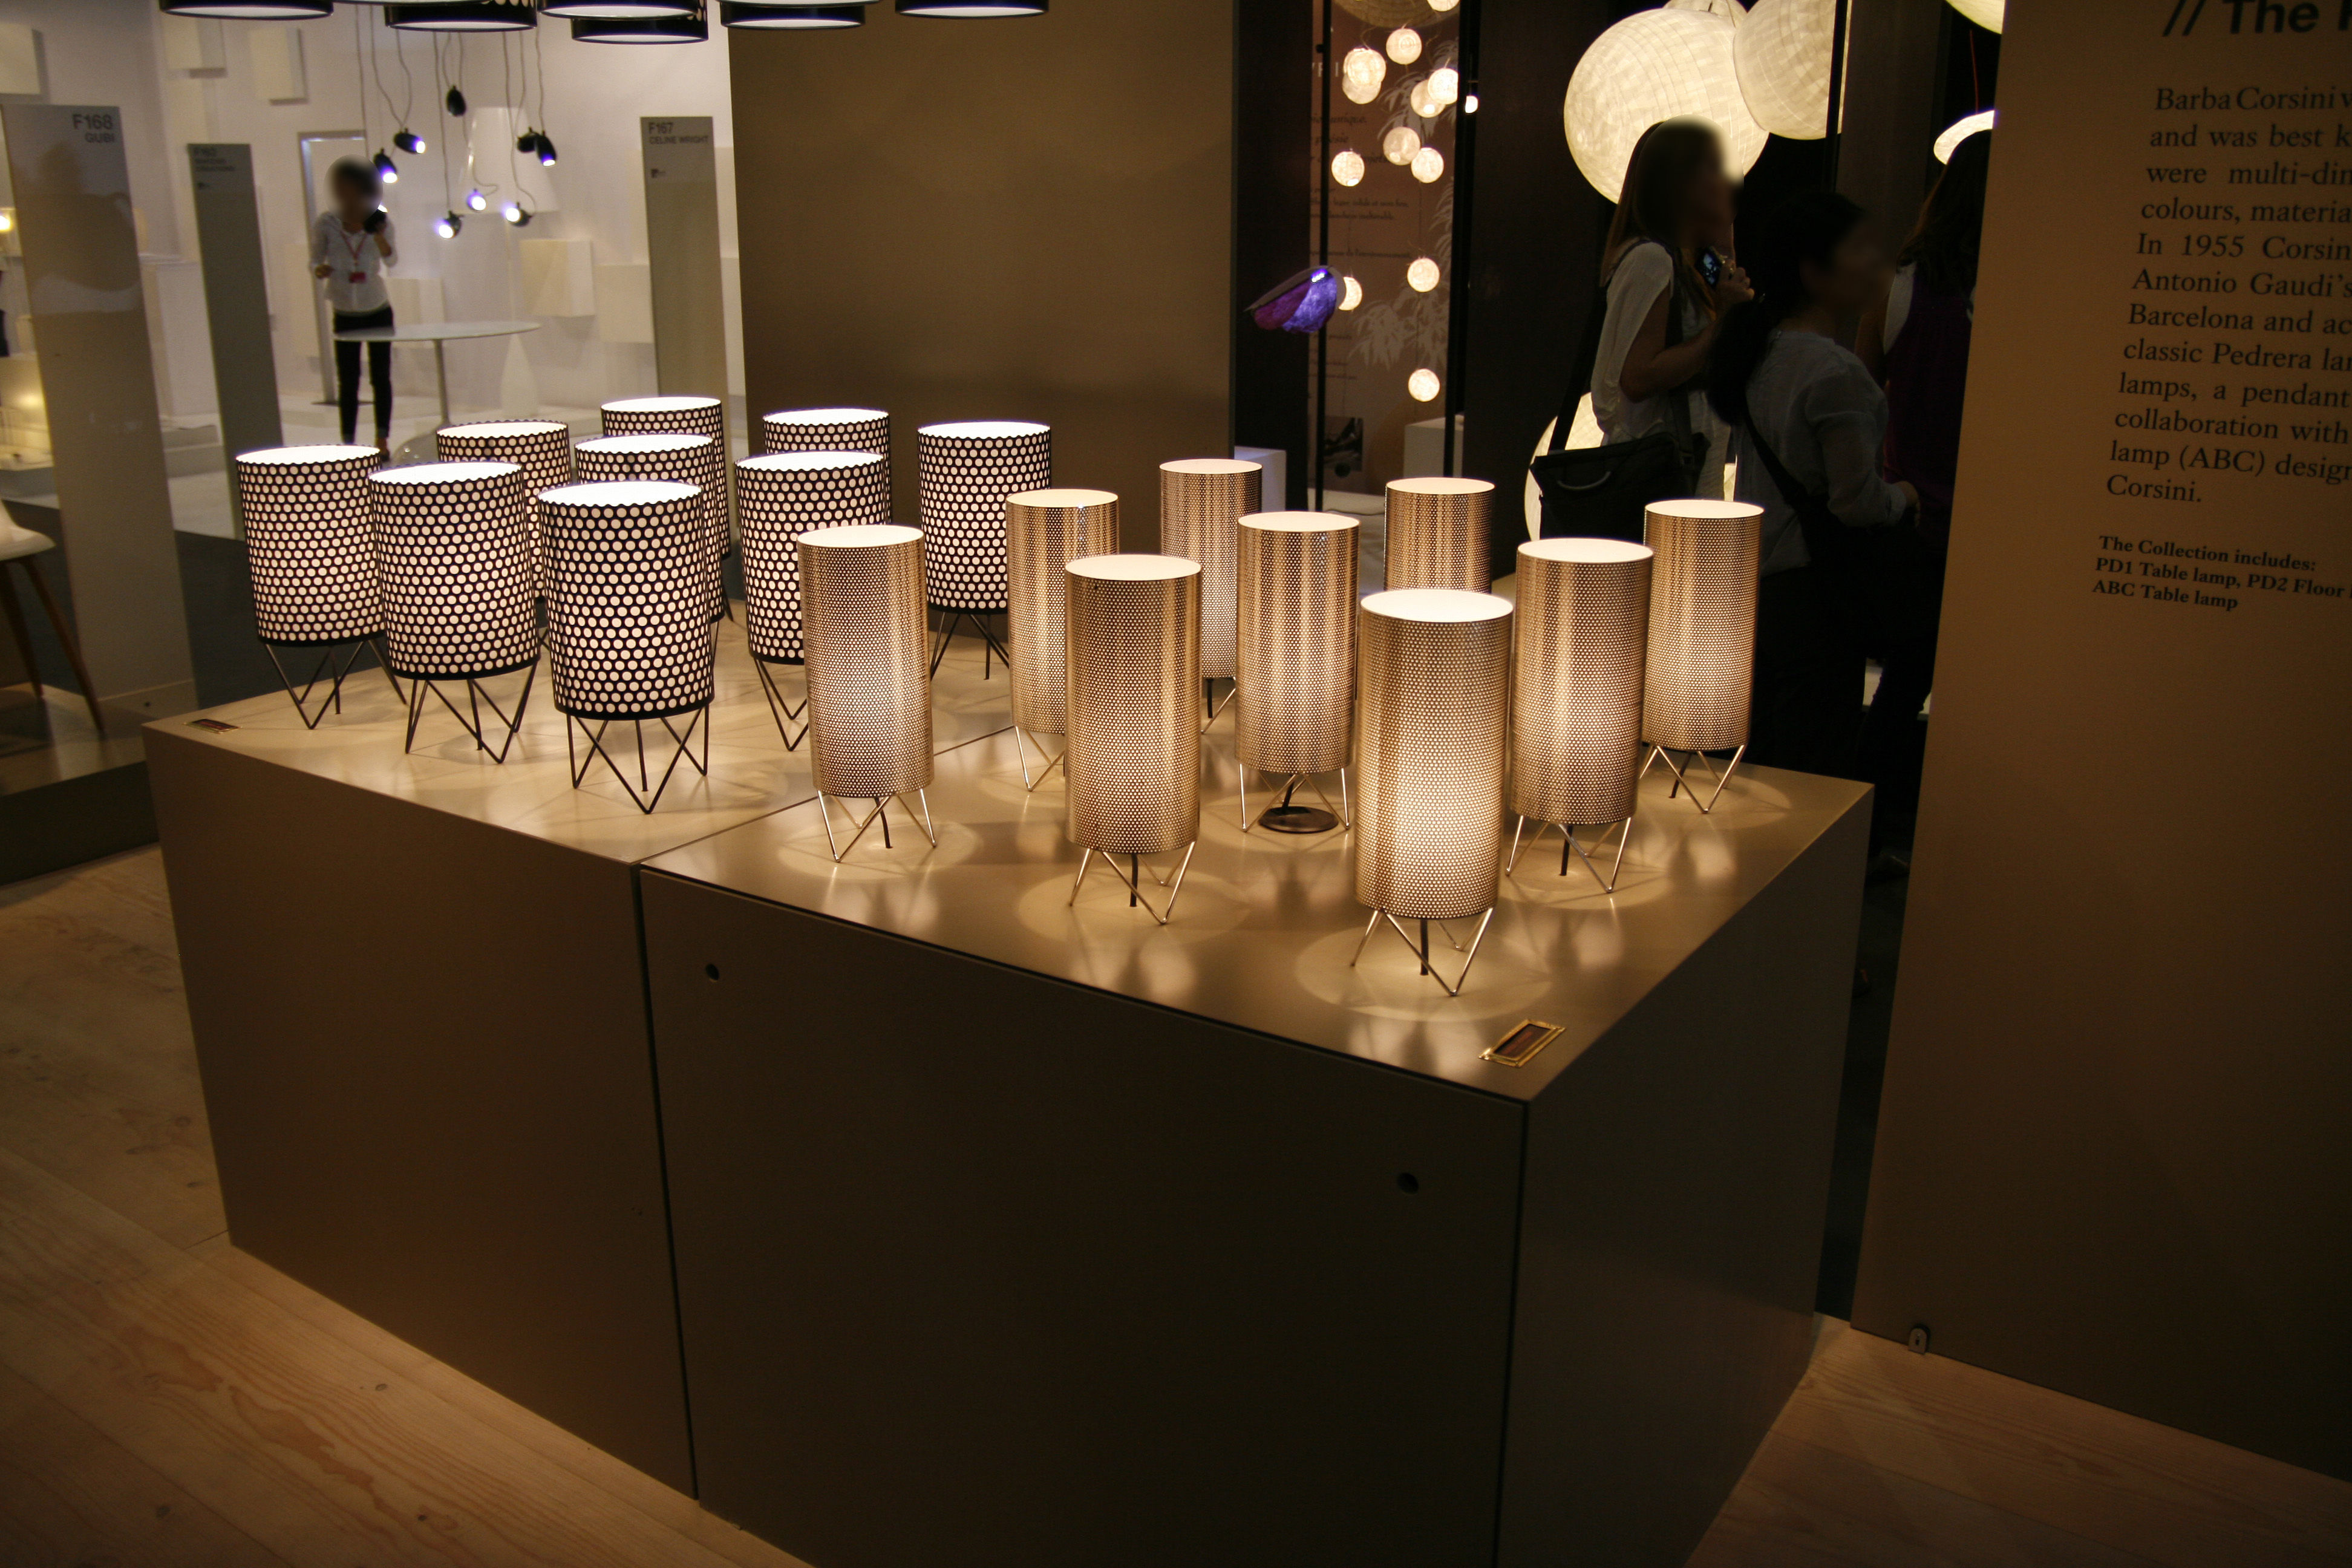 Pedrera H2O Table lamp ˜ 13 x H 33 cm Black by Gubi Pedrera